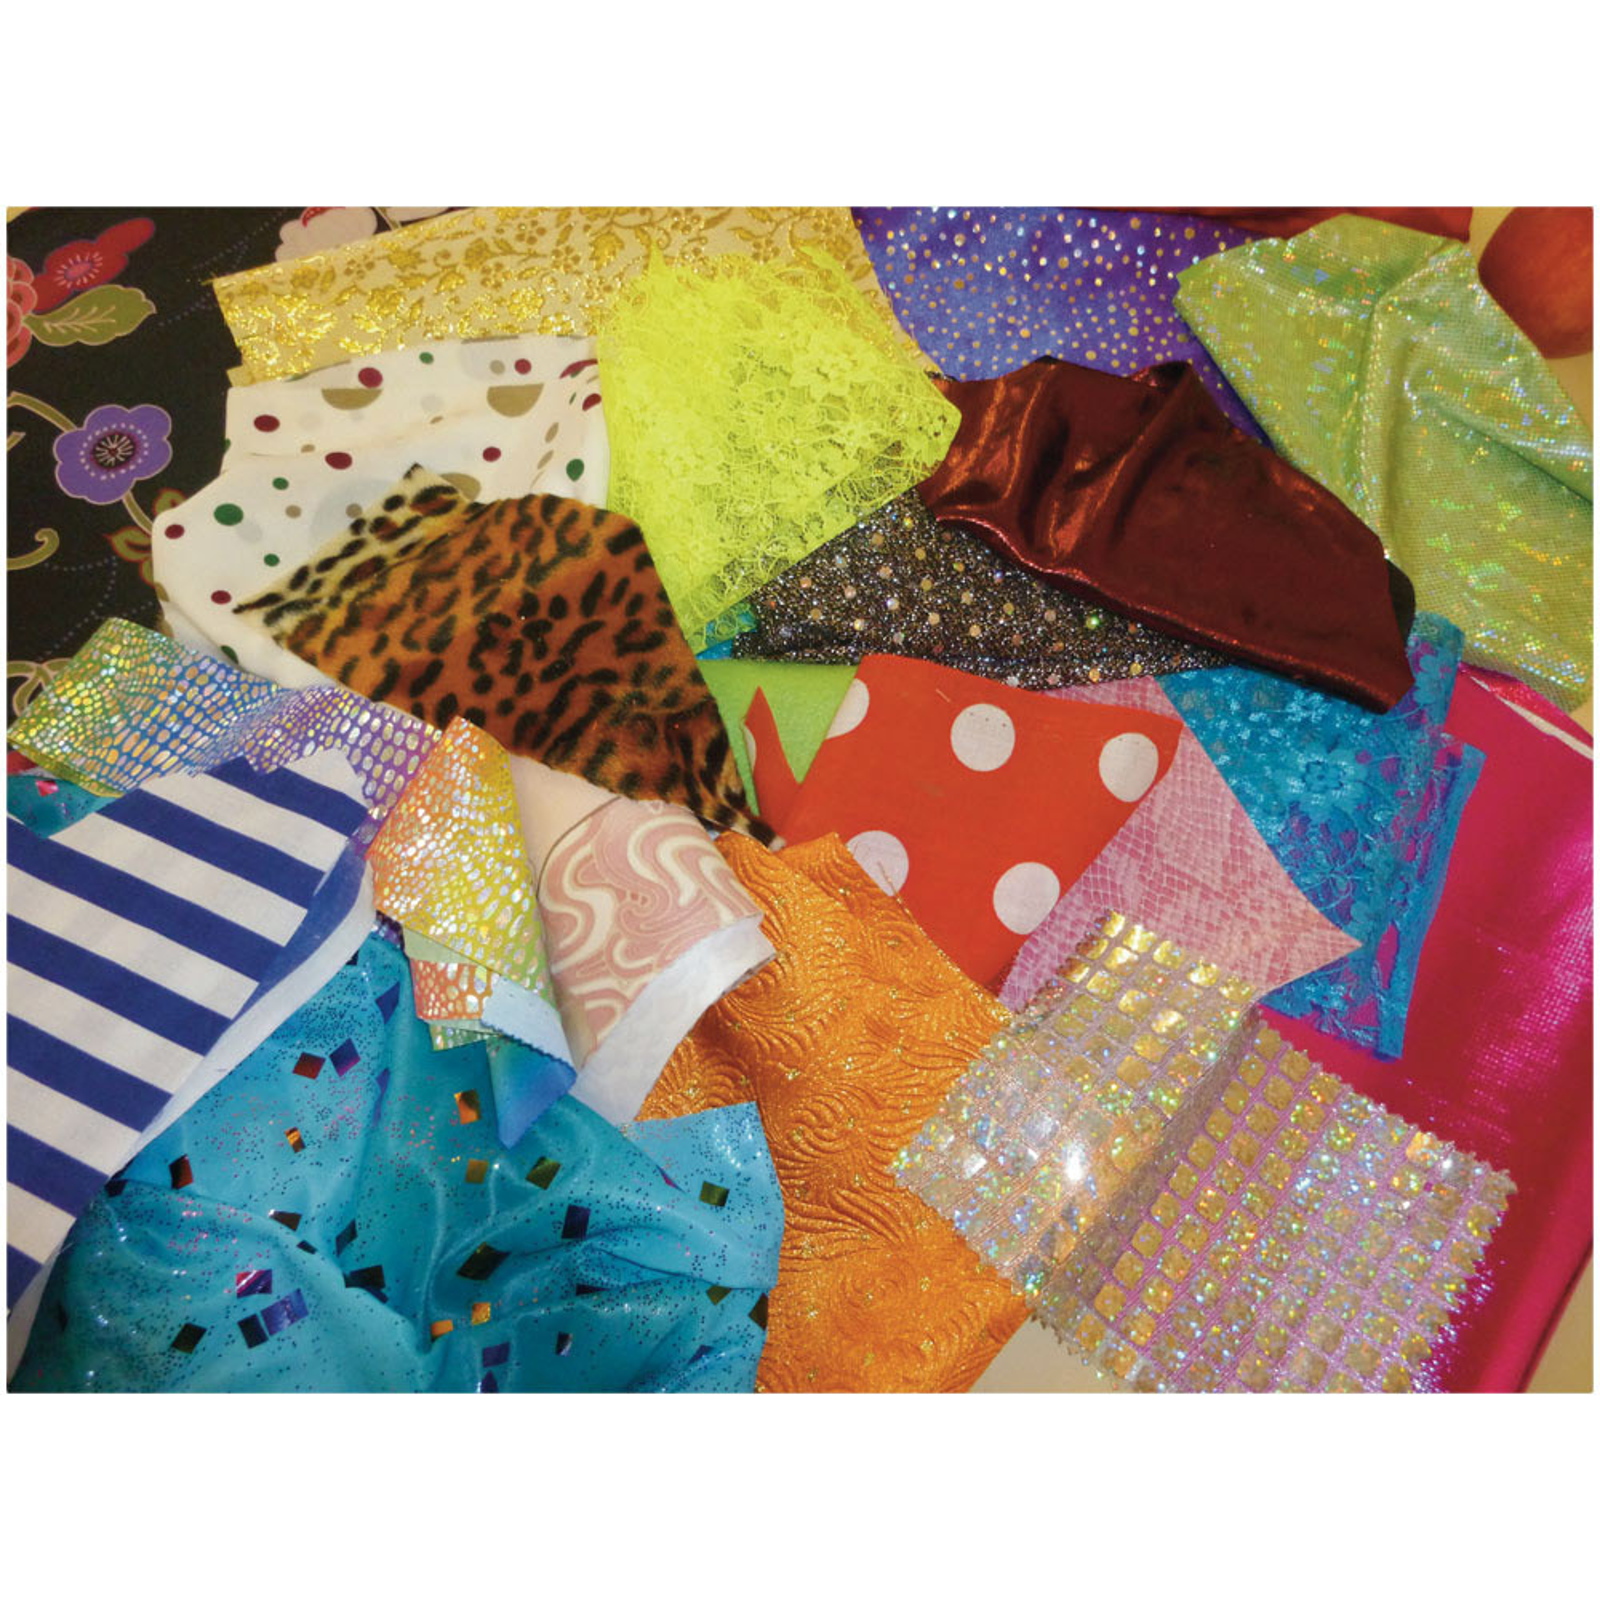 Fabric Off-Cuts